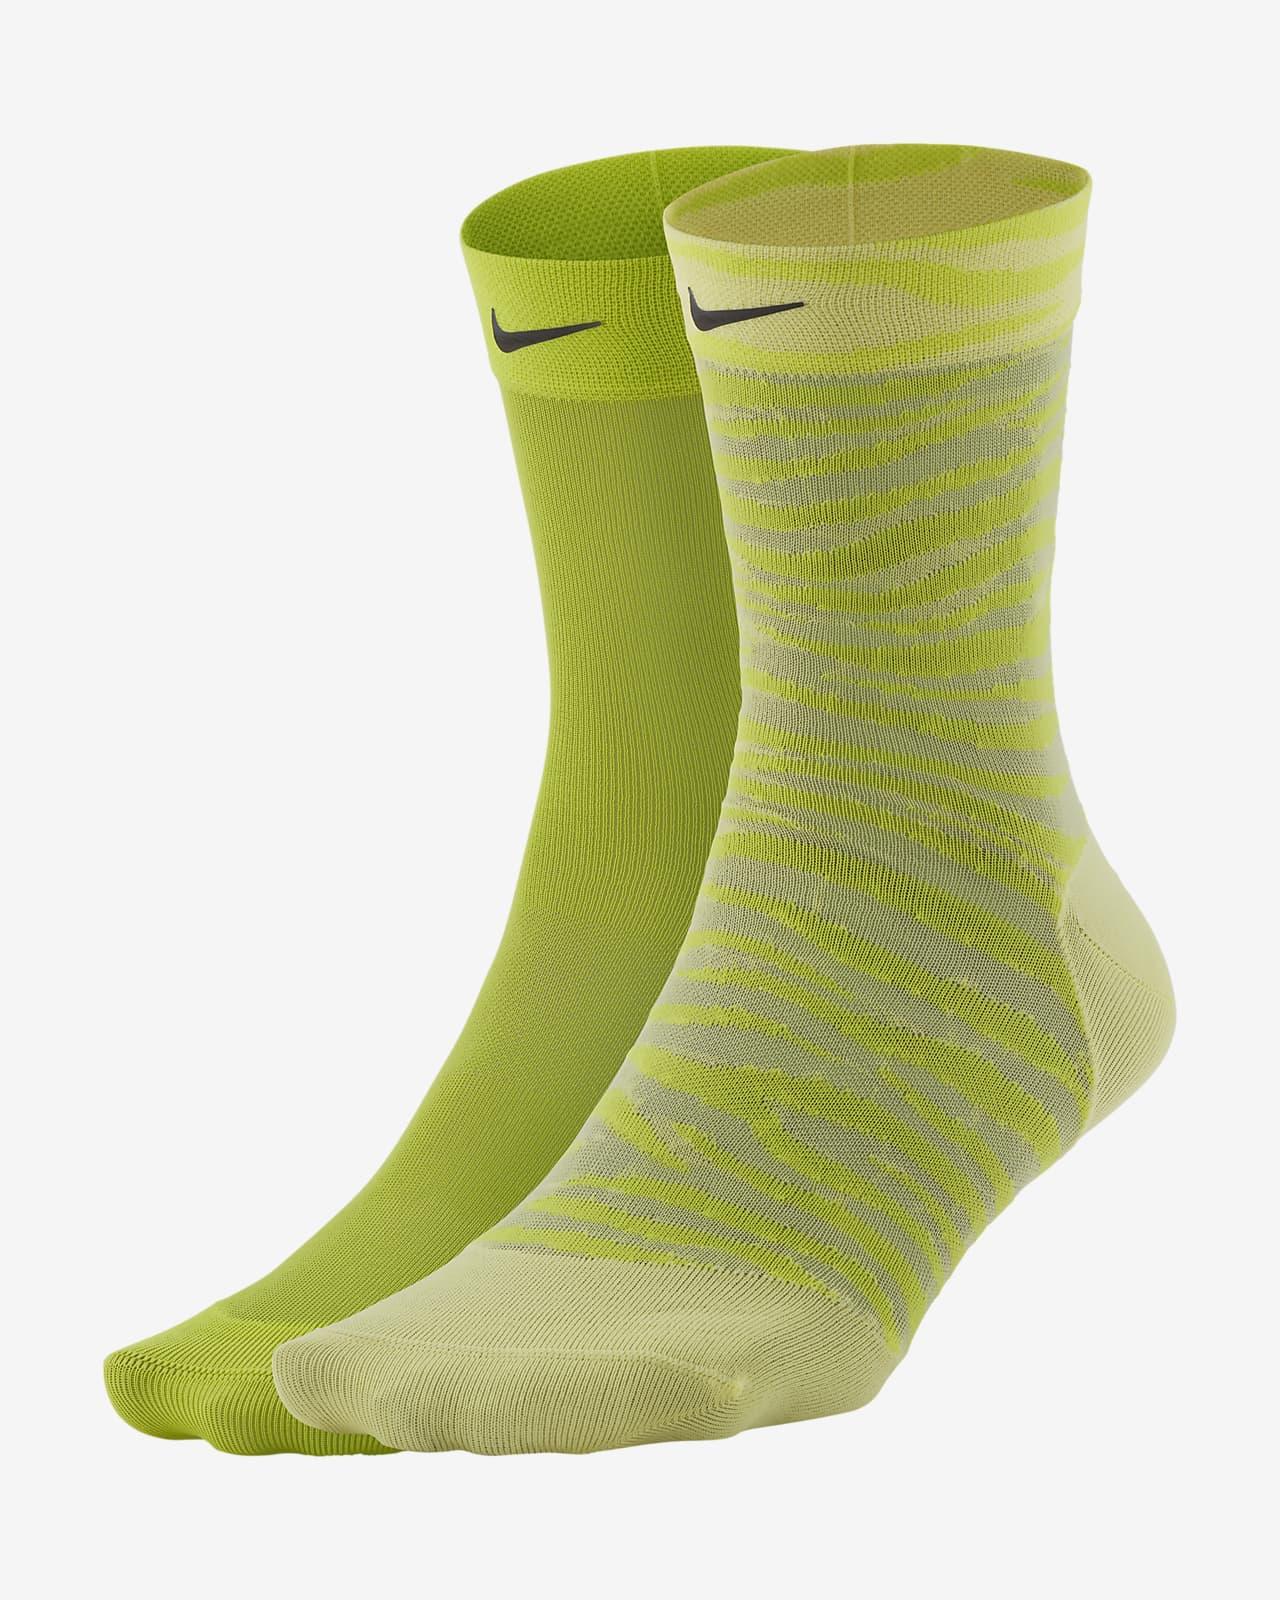 Nike Sheer Women's Training Ankle Socks (2 Pairs)